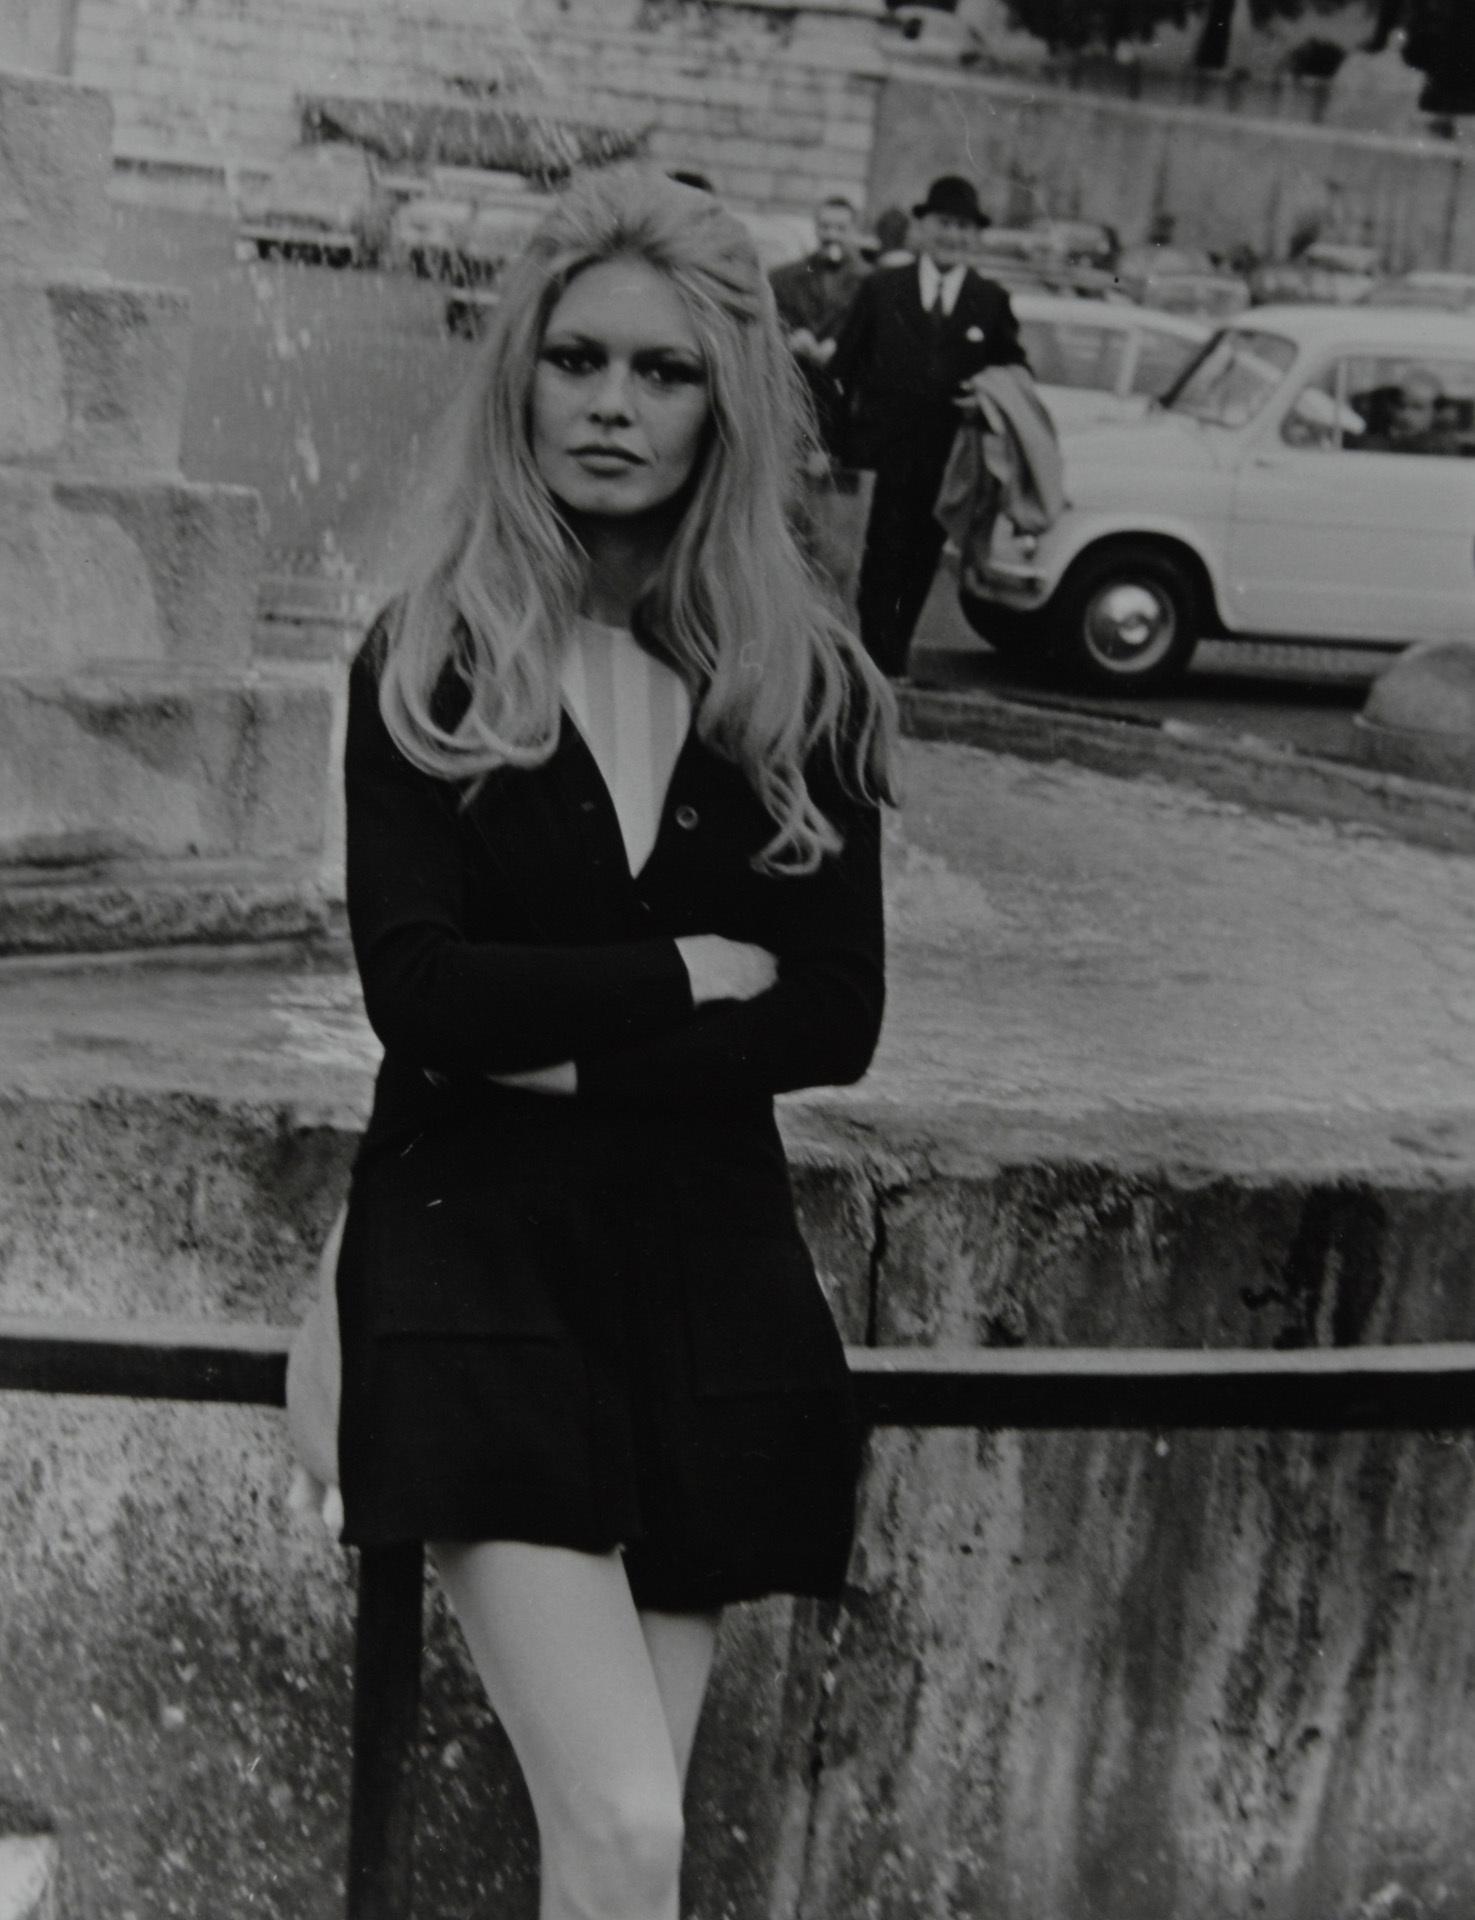 La Verde Vittorio, 4 photographs: Brigitte Bardot in Rome